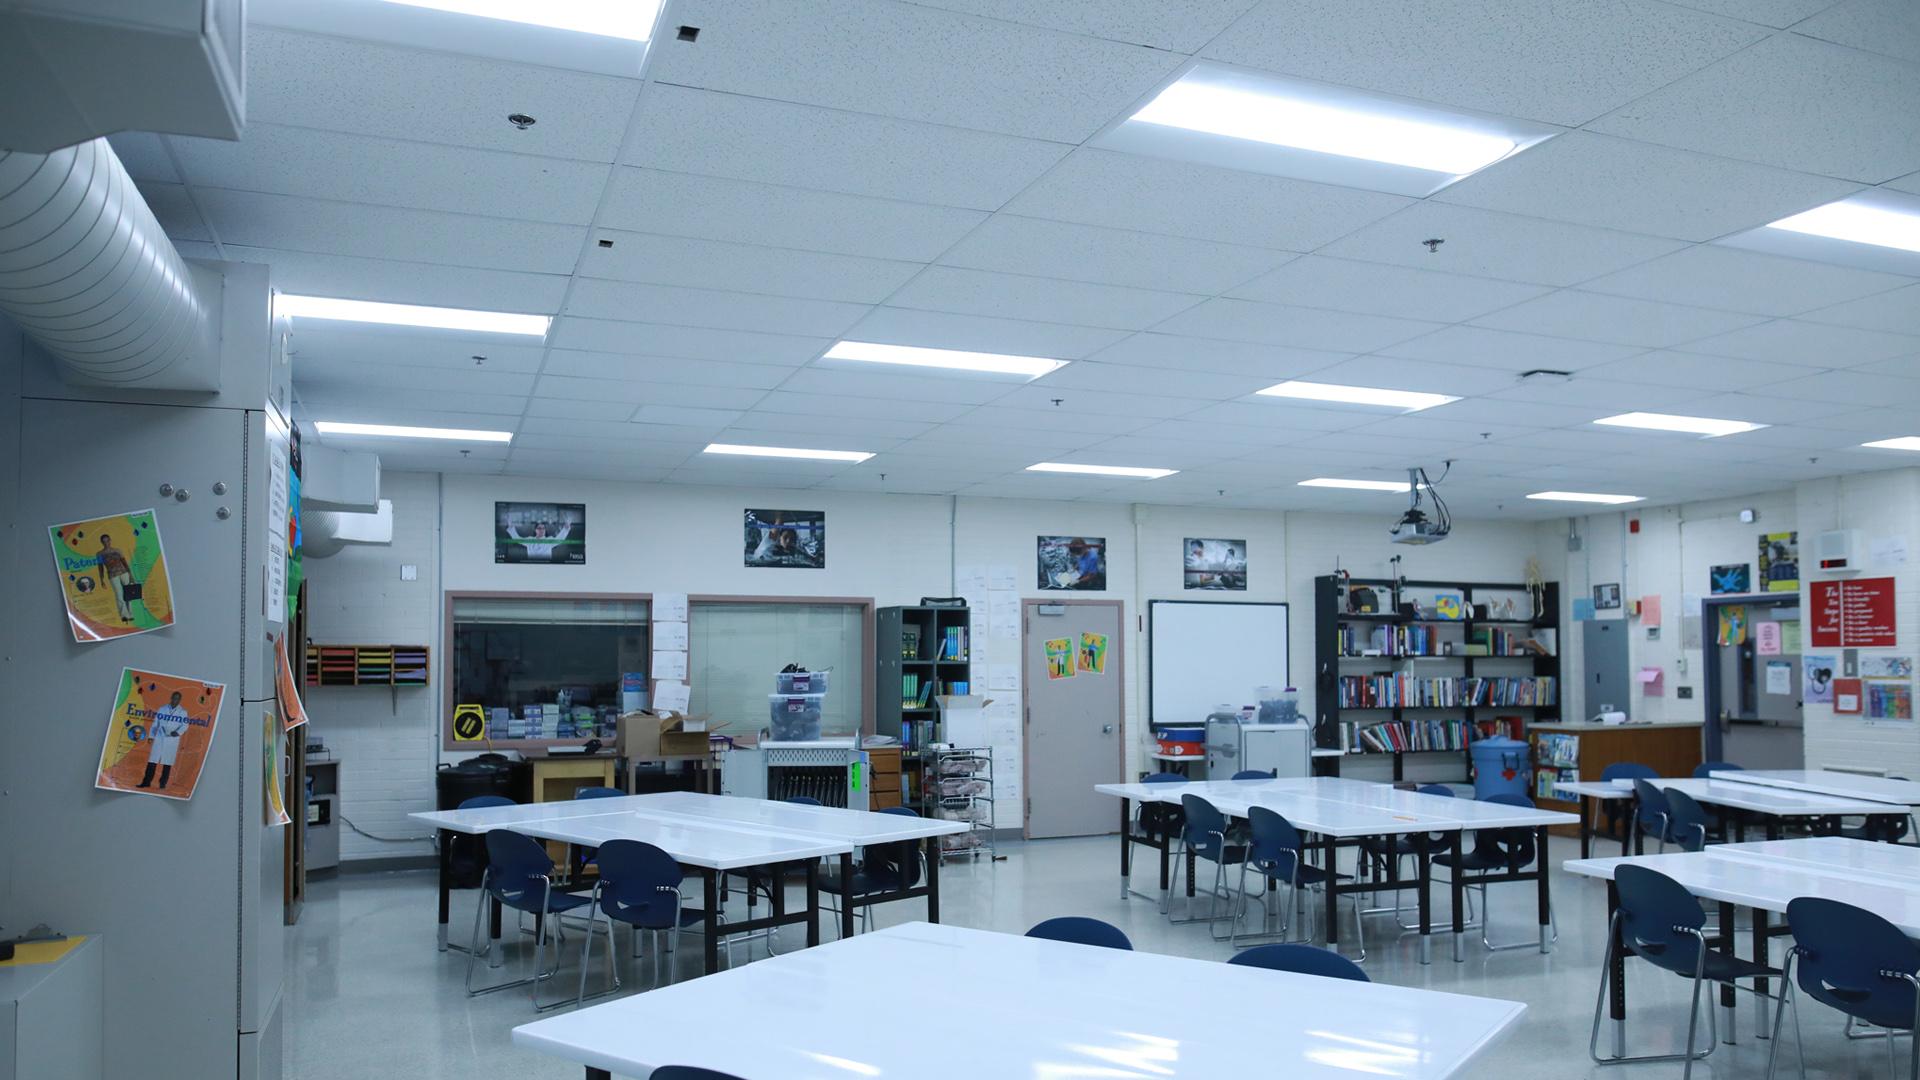 BEETLE in Classroom (Tunable)